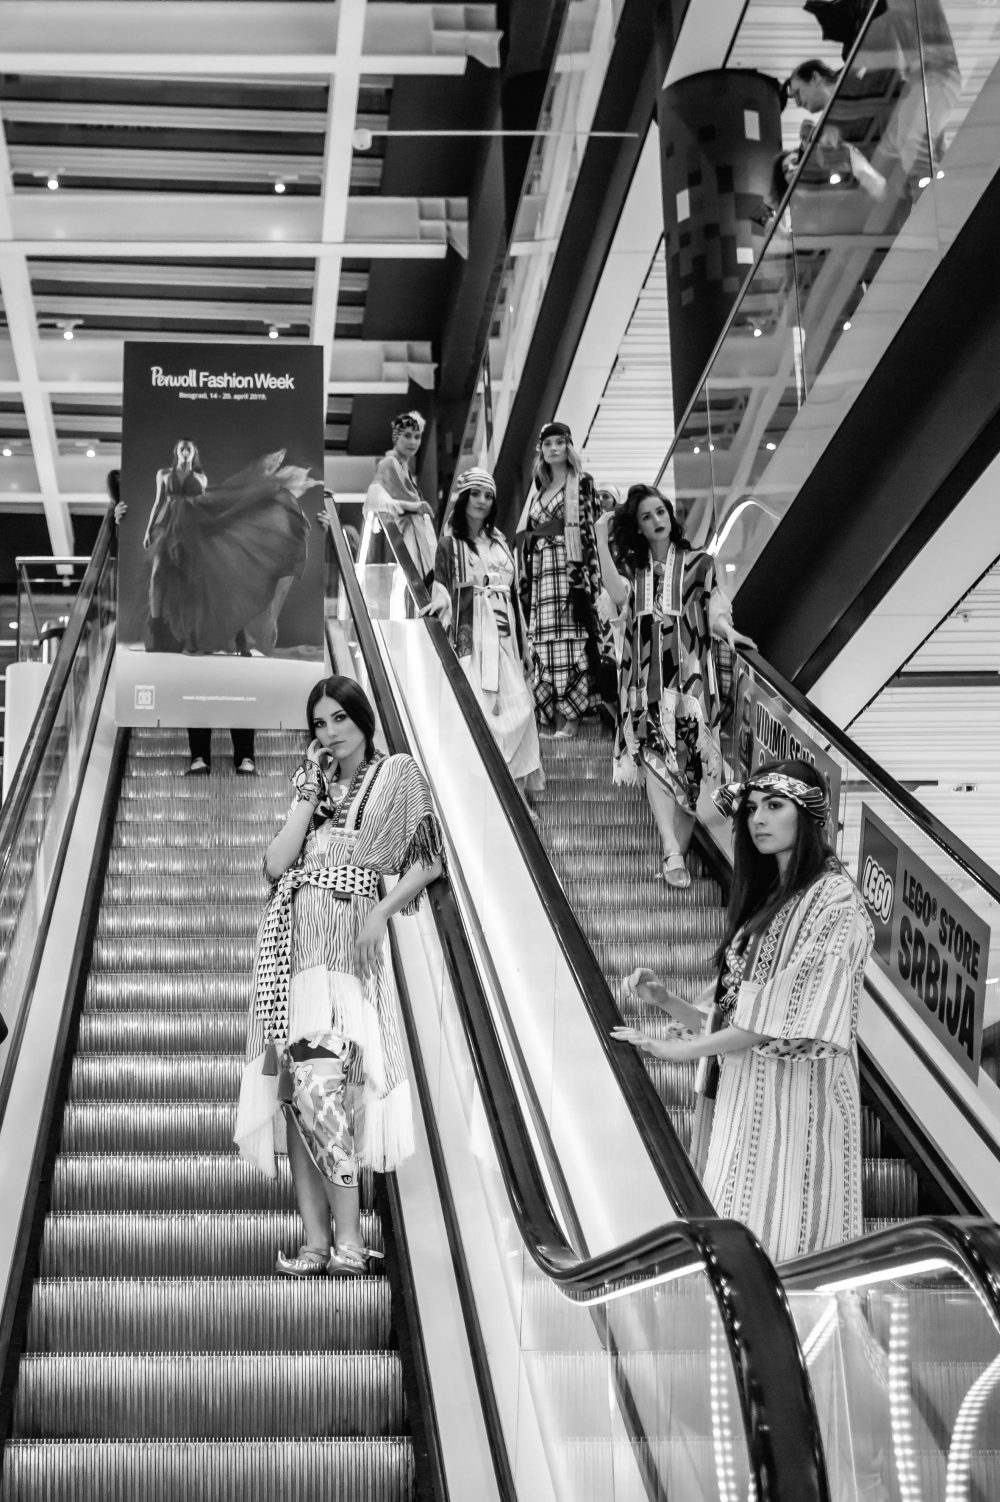 Predrag Đorđević 4 e1555516626805 Perwoll Fashion Week: Otvorena izložba A New Beginning